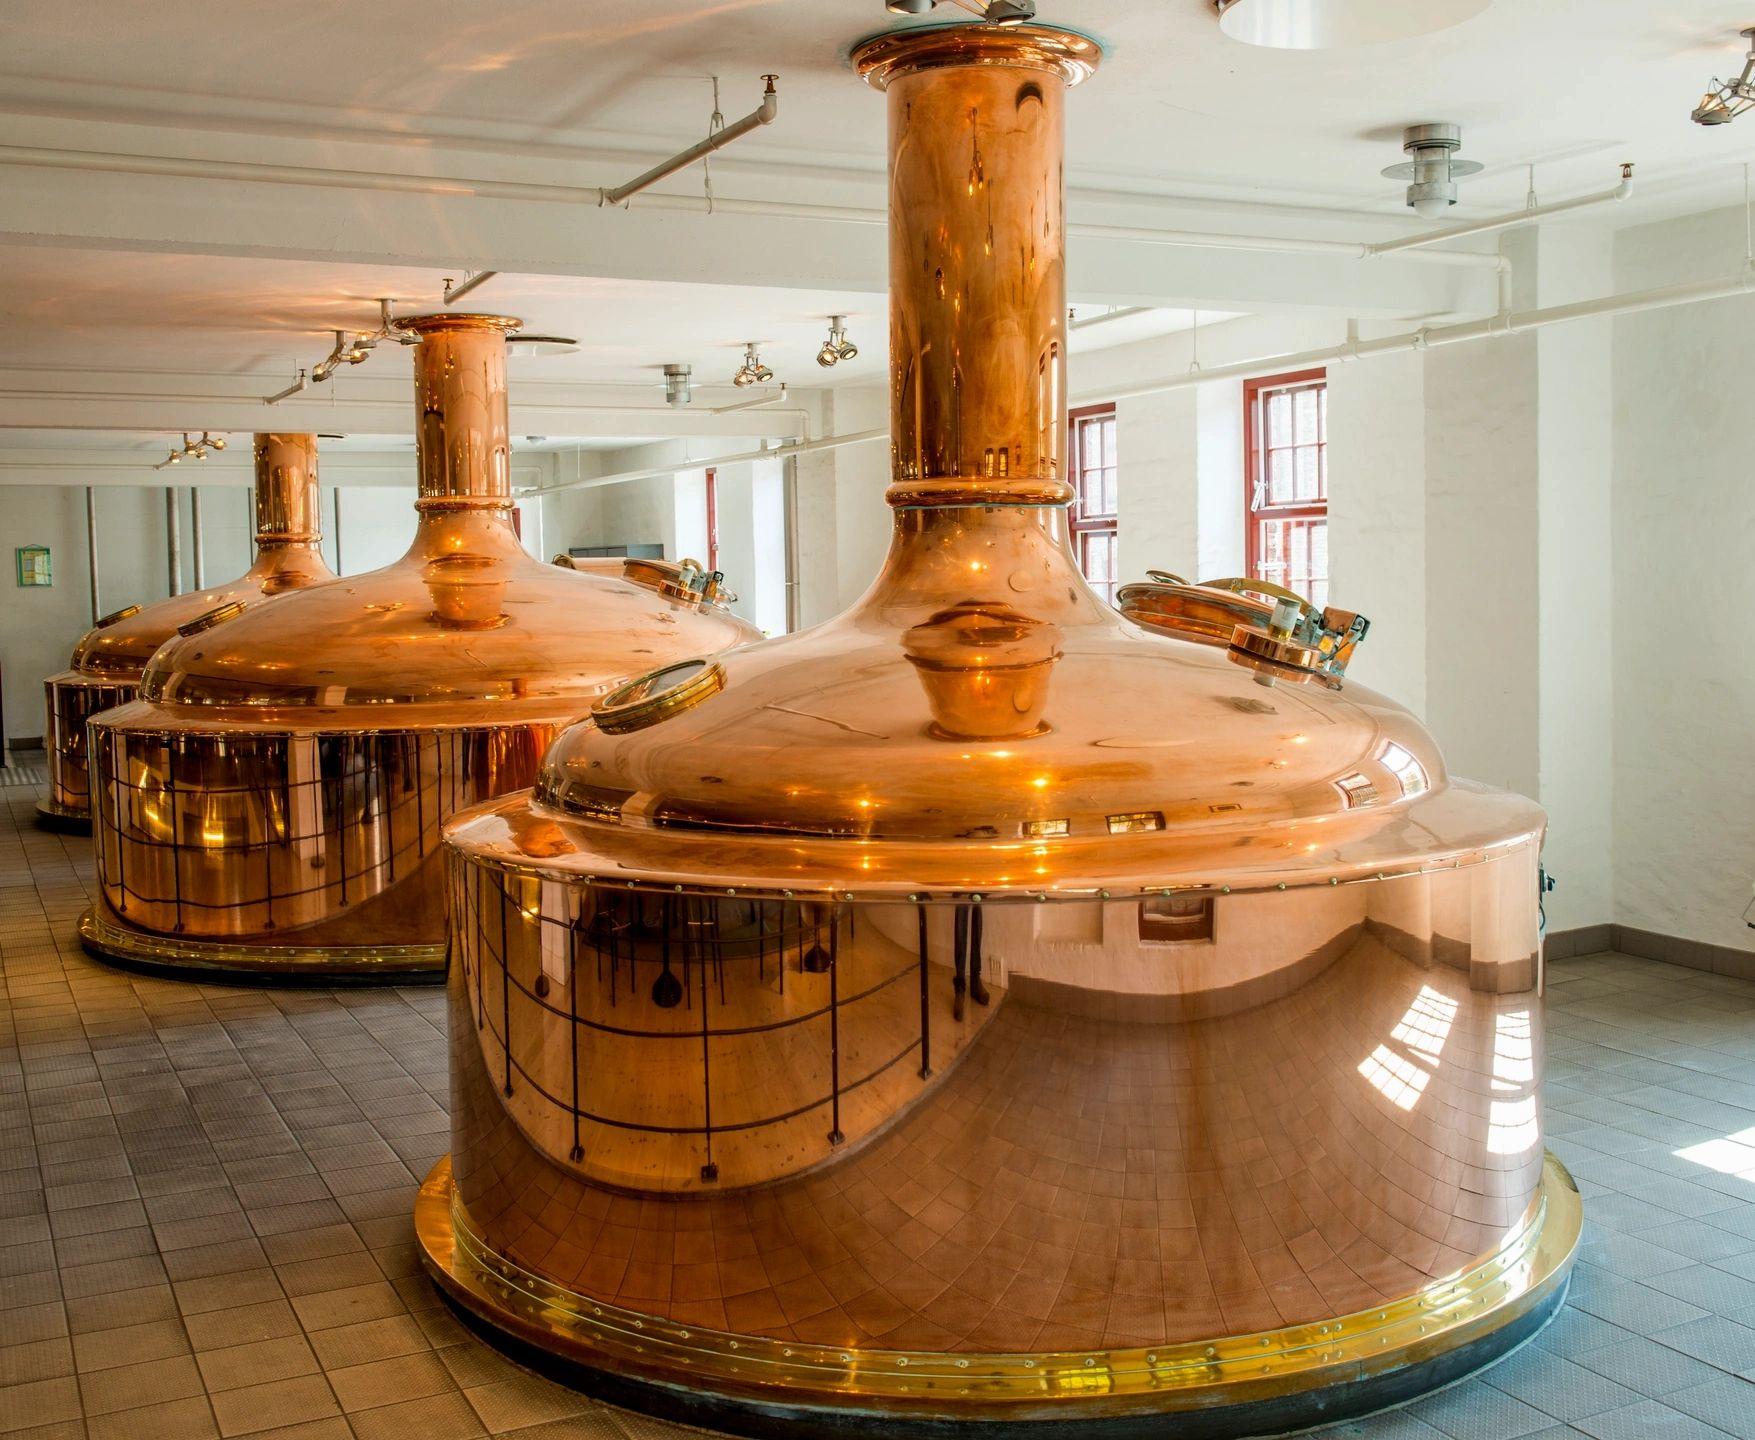 Use T.A.C.T W.I.N.S To Clean And Sanitize Your Brewery